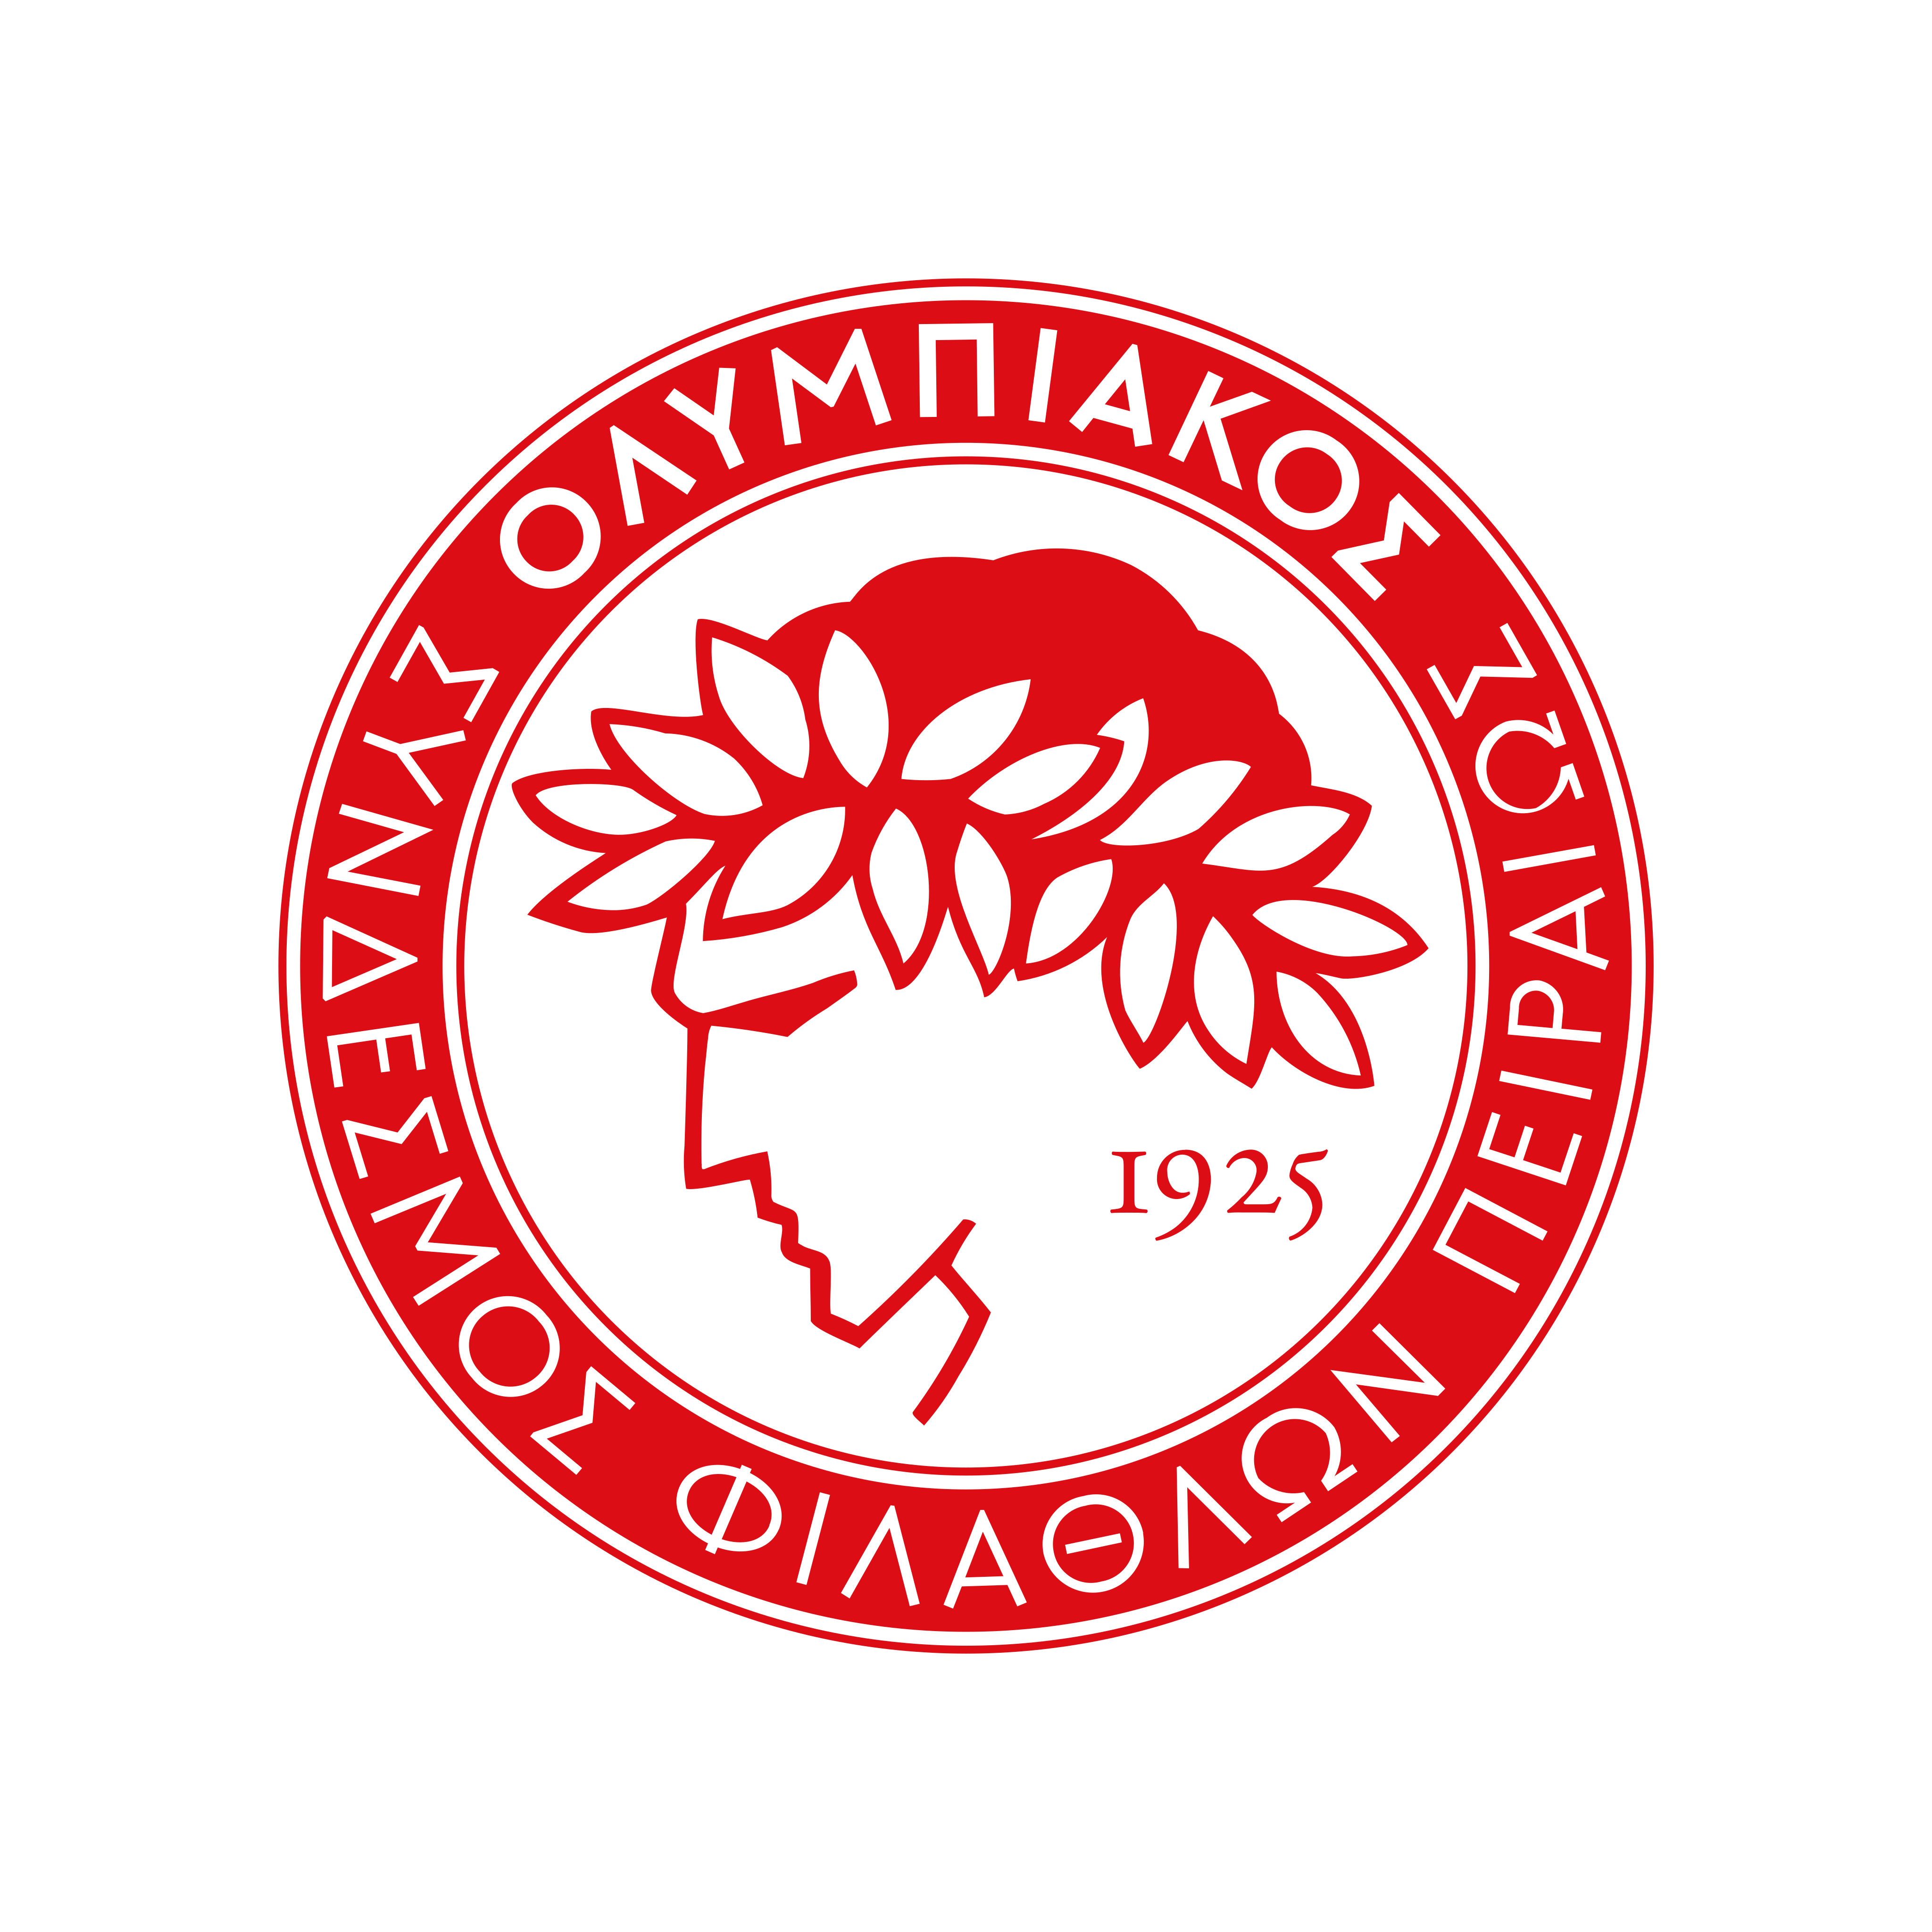 olympiacos logo 0 - Olympiacos Logo - Escudo